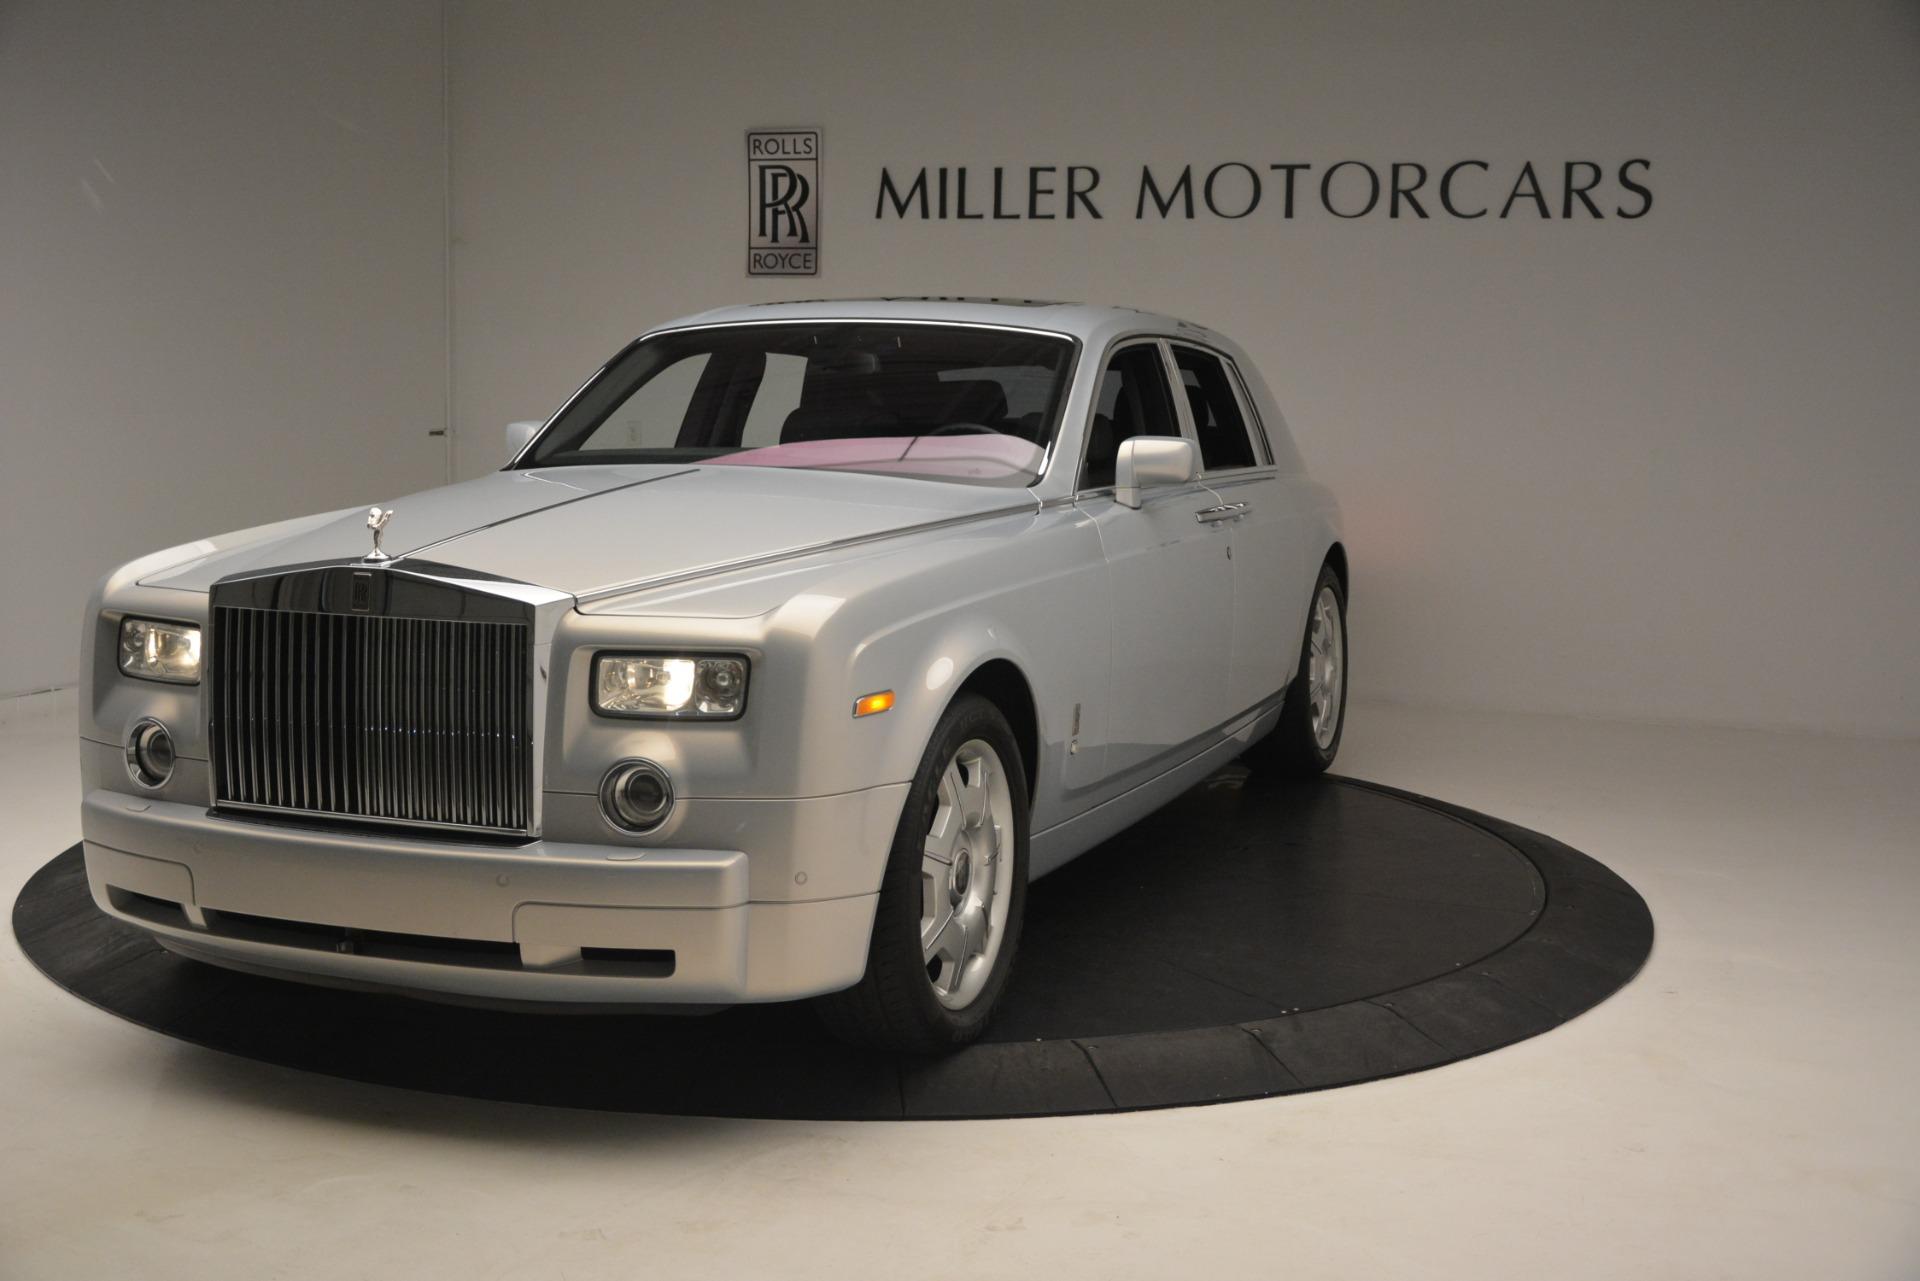 Used 2007 Rolls-Royce Phantom  For Sale In Greenwich, CT 3089_p3